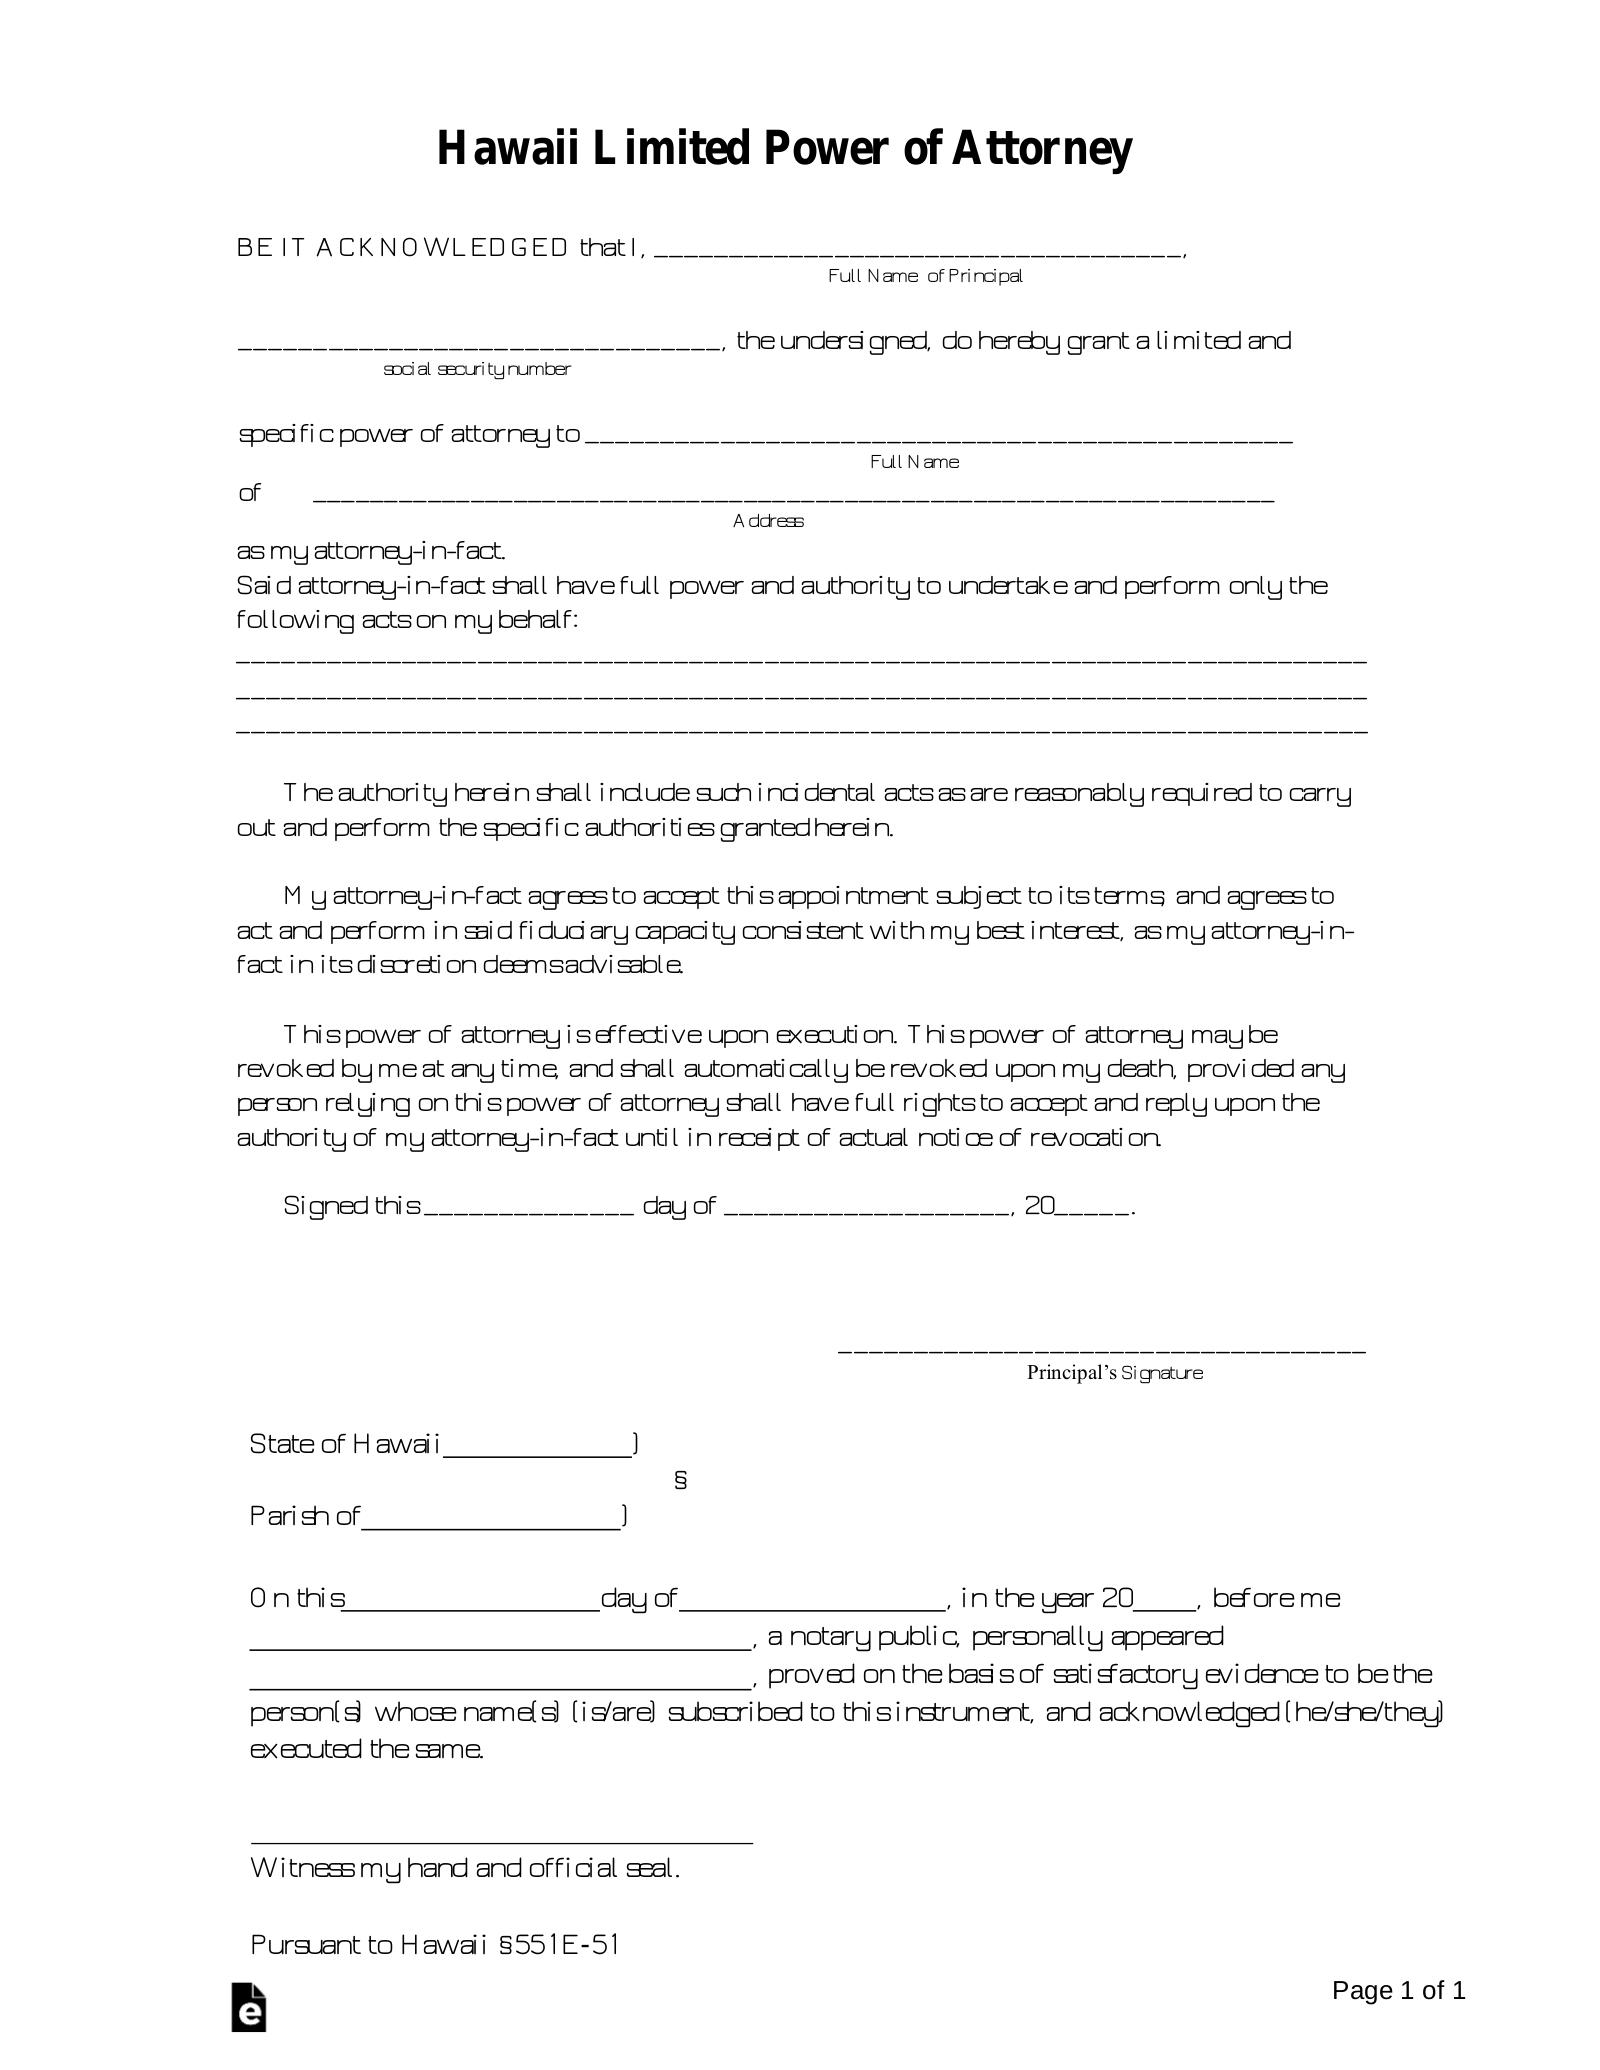 power of attorney form hawaii  Free Hawaii Limited Power of Attorney Form - PDF   Word ...